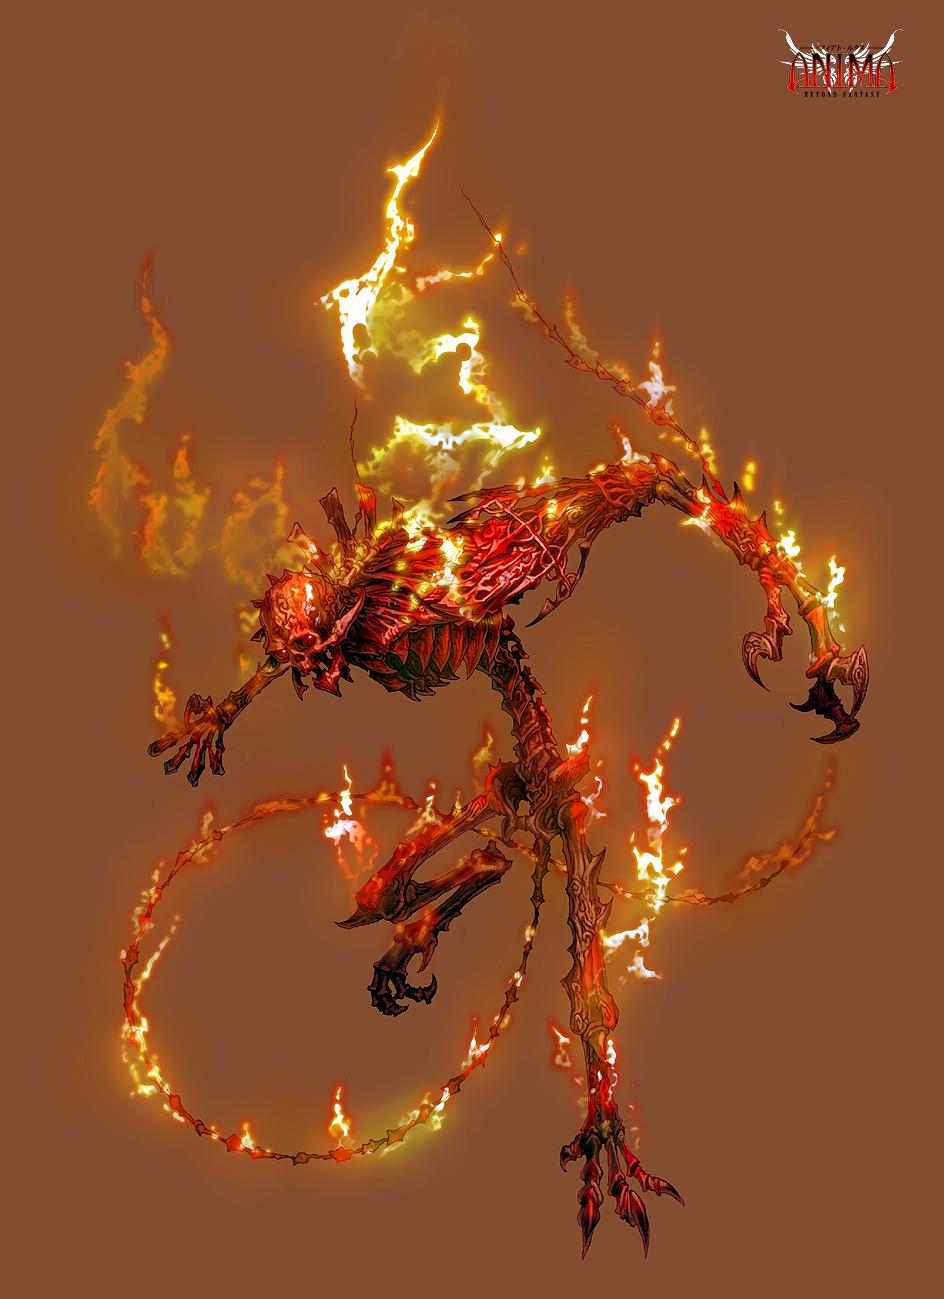 peru blog fire demon